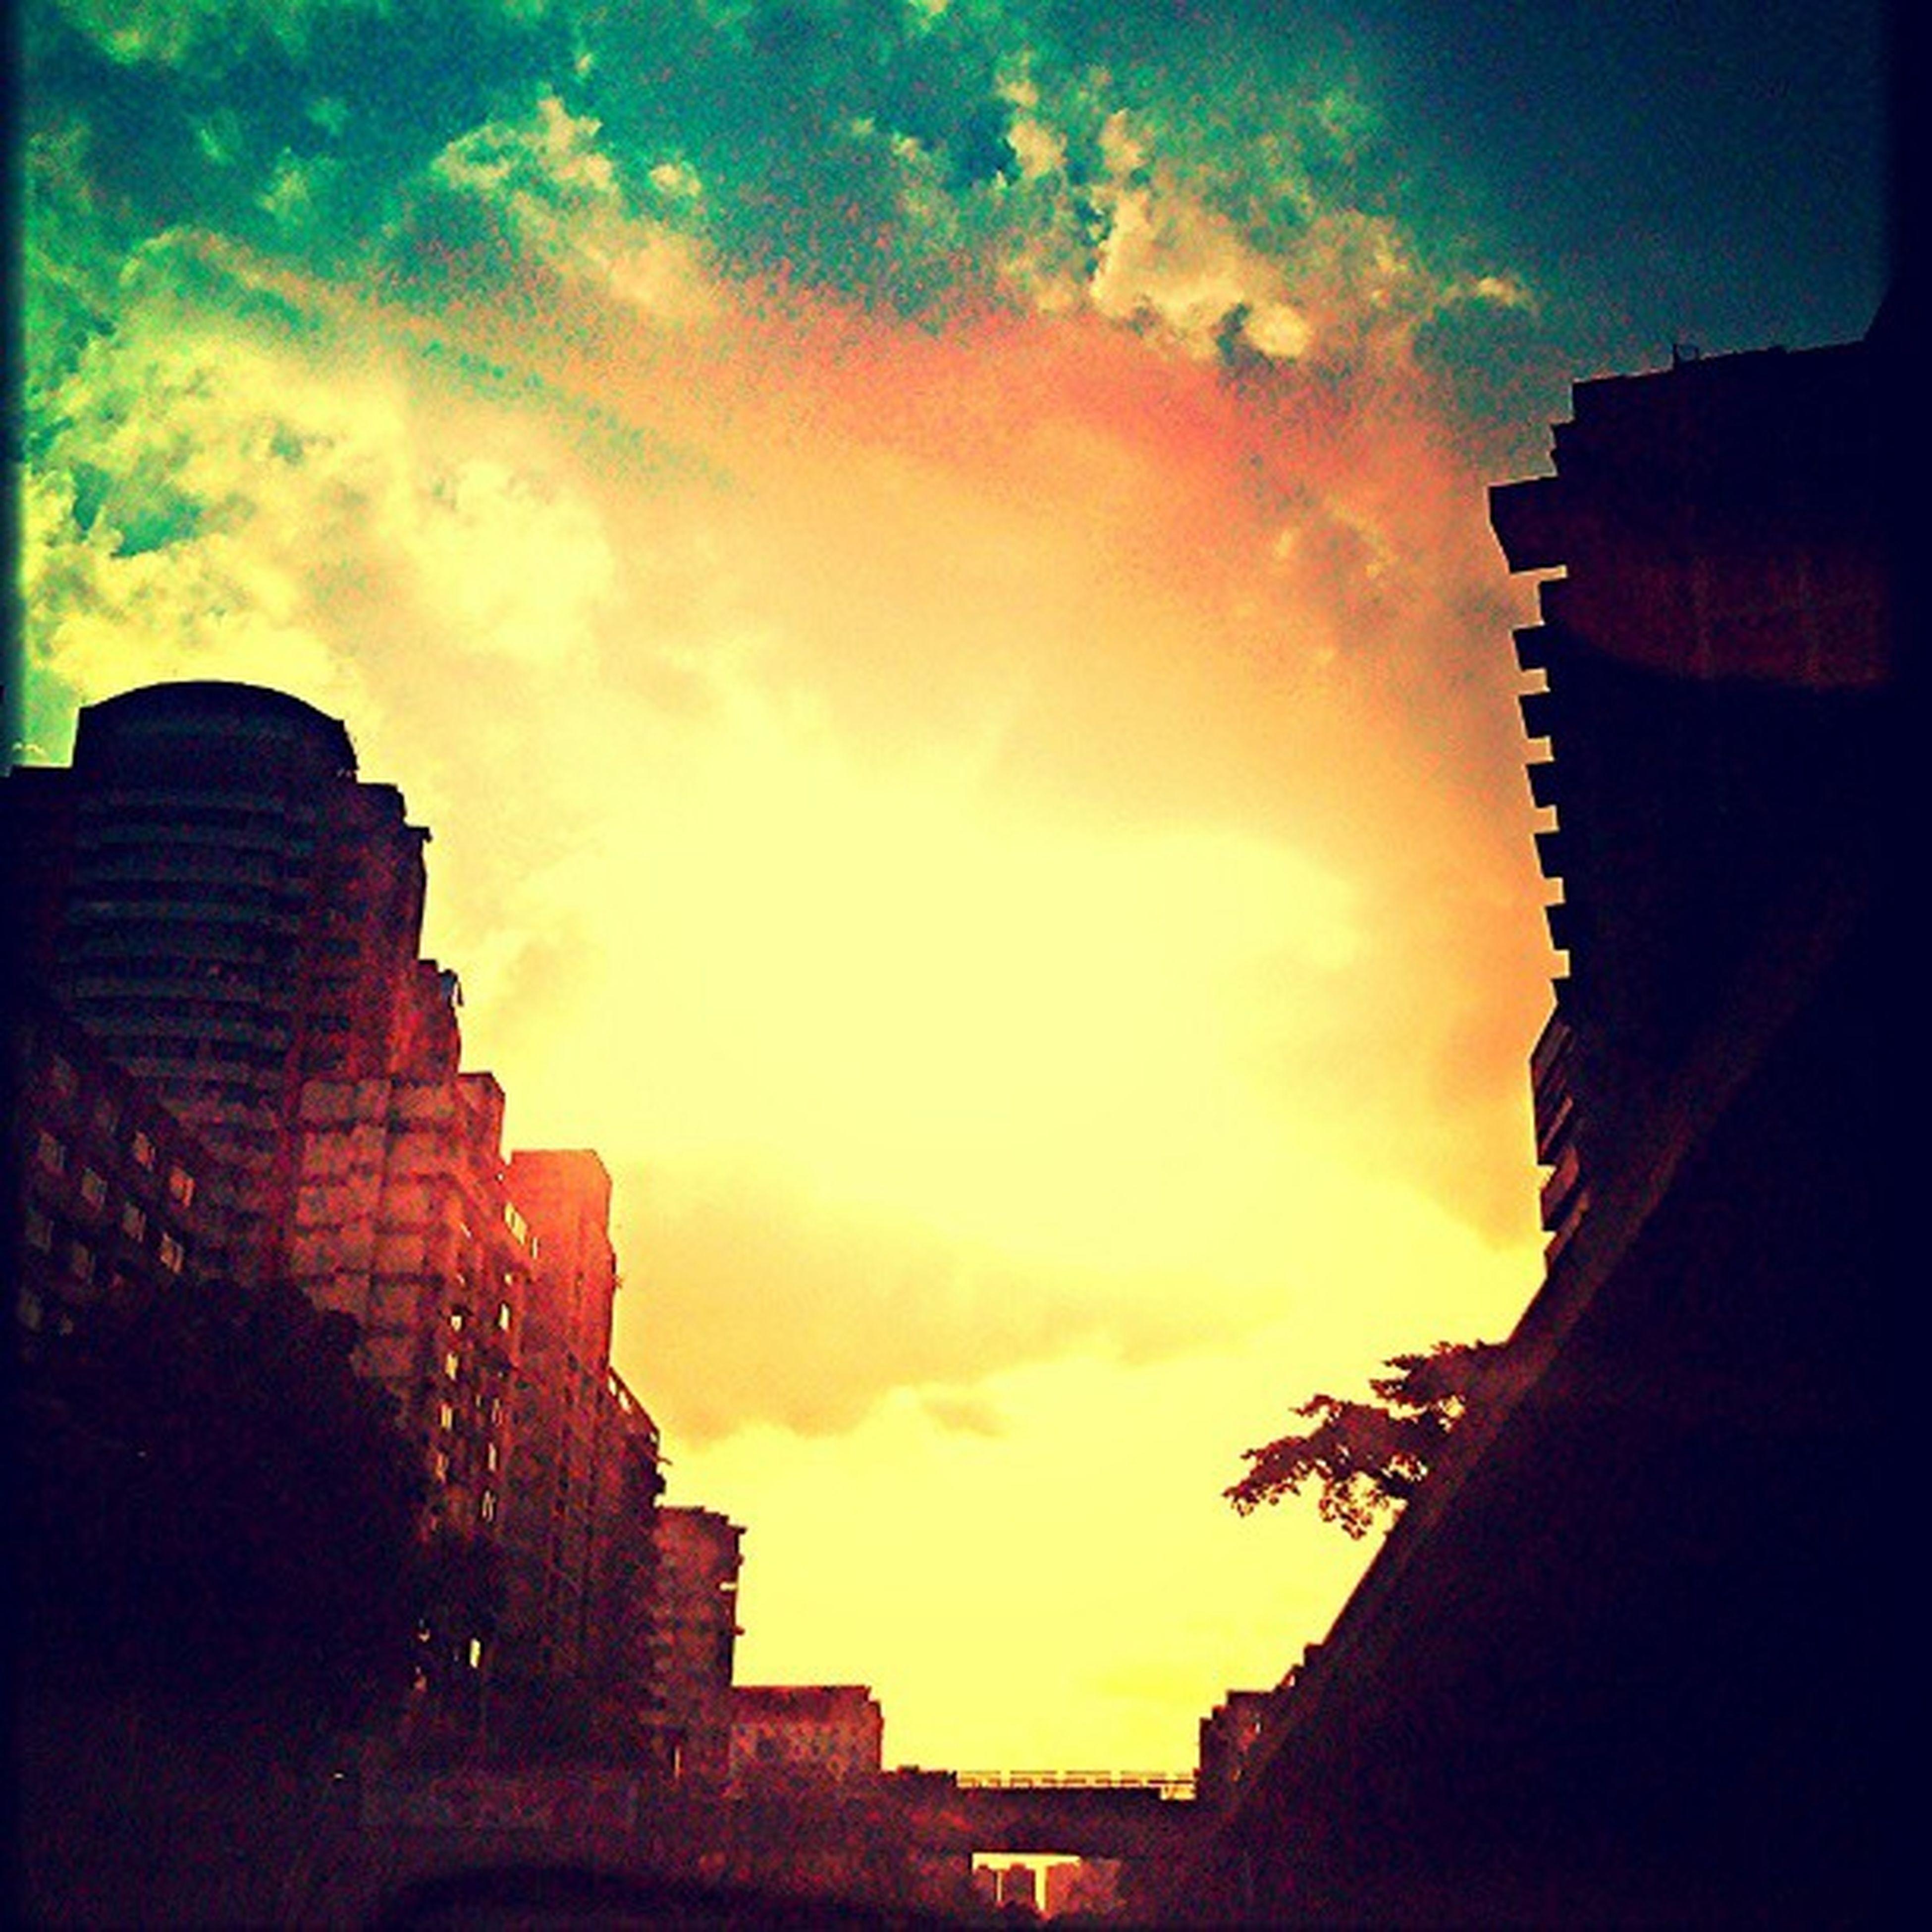 Tarde caraqueña sabatina. Fernandoluna . Fotografosvenezolanos . Instagramers . Igers . igersmundo. igersvenezuela. igerscaracas. igersmiranda. igersmaracay. igersaltosmirandinos. instavenezuela. insta_ve. instaphoto. urbangangfamily. venezuelafotos_. venezuelaforum. statigram. ig_caracas. photoblipoint. venezuela. gangfamily. streetphotovenezuela. streetphotography. gf_ve. instamoment. instacapture. instamood. gang_family. statigram. venezuelaes.